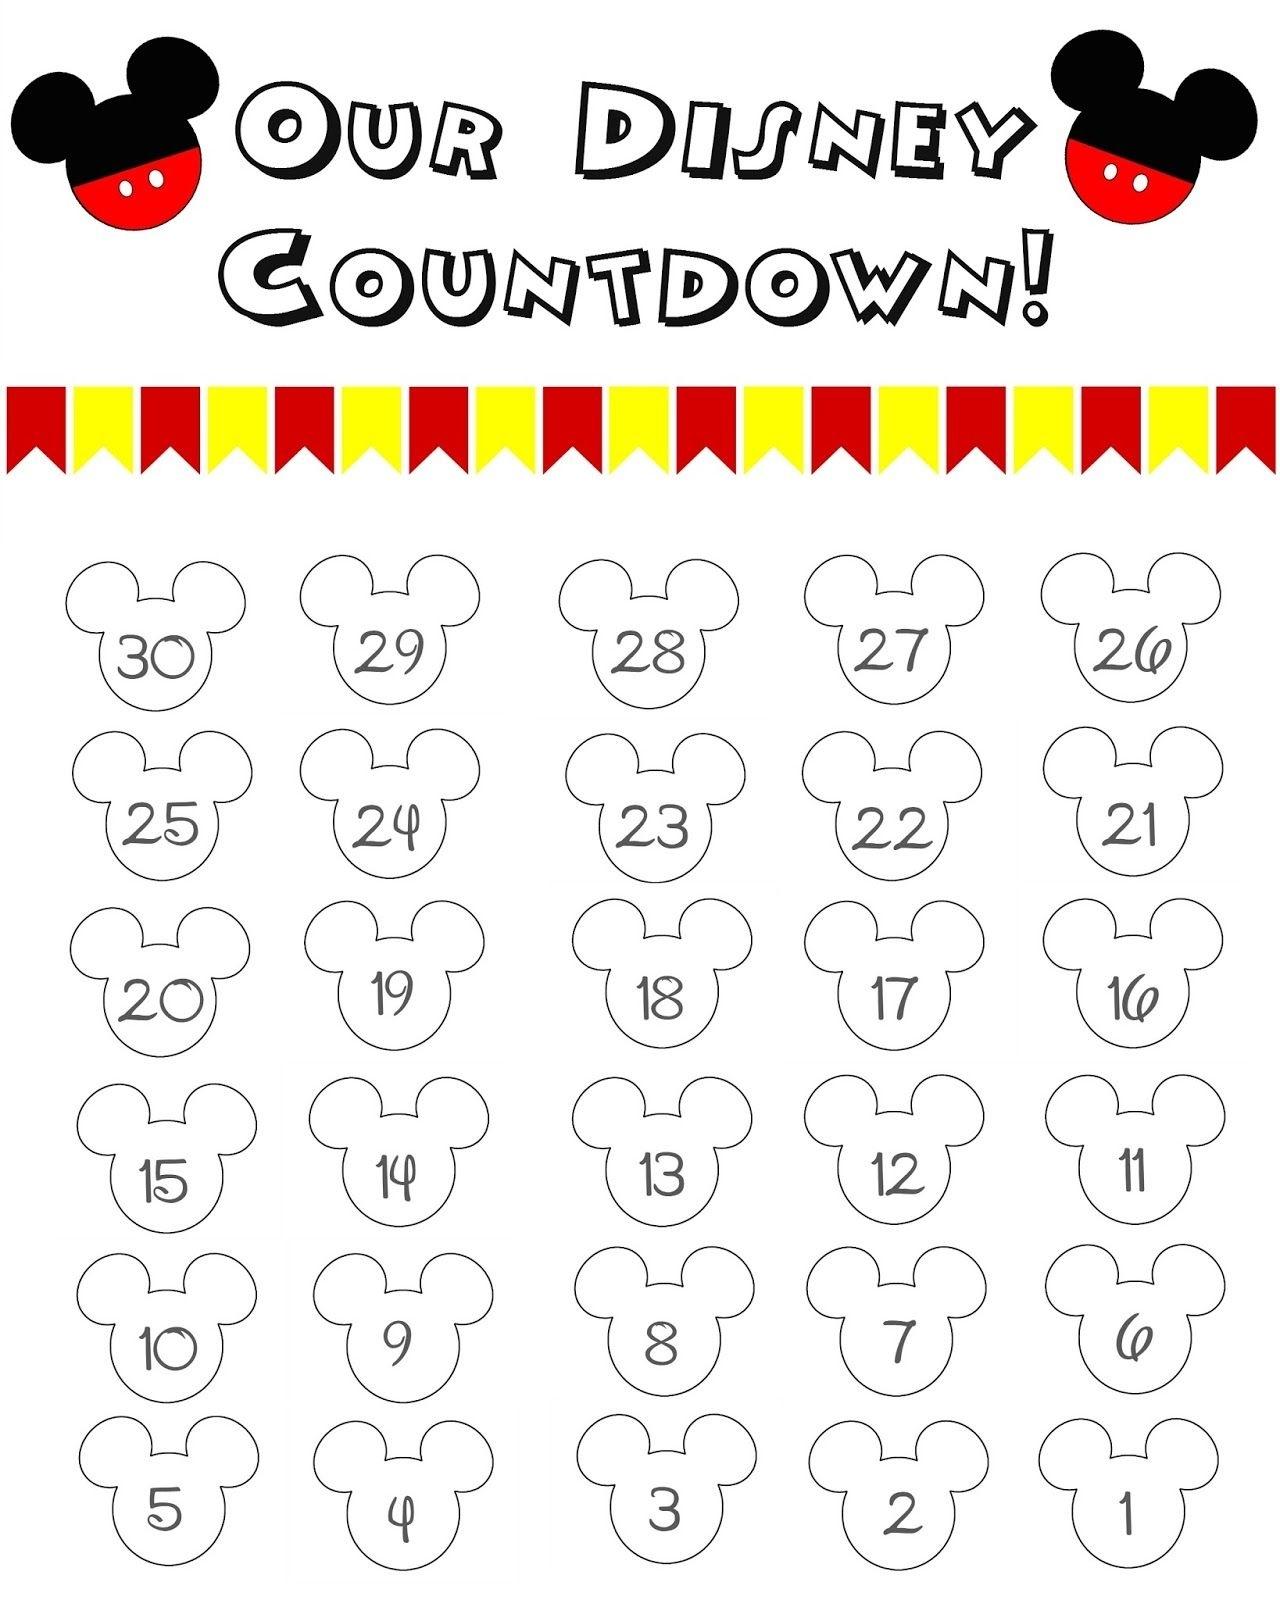 Disney World Countdown Calendar - Free Printable!! | Travel_Countdown Calendar To Disney Vacation